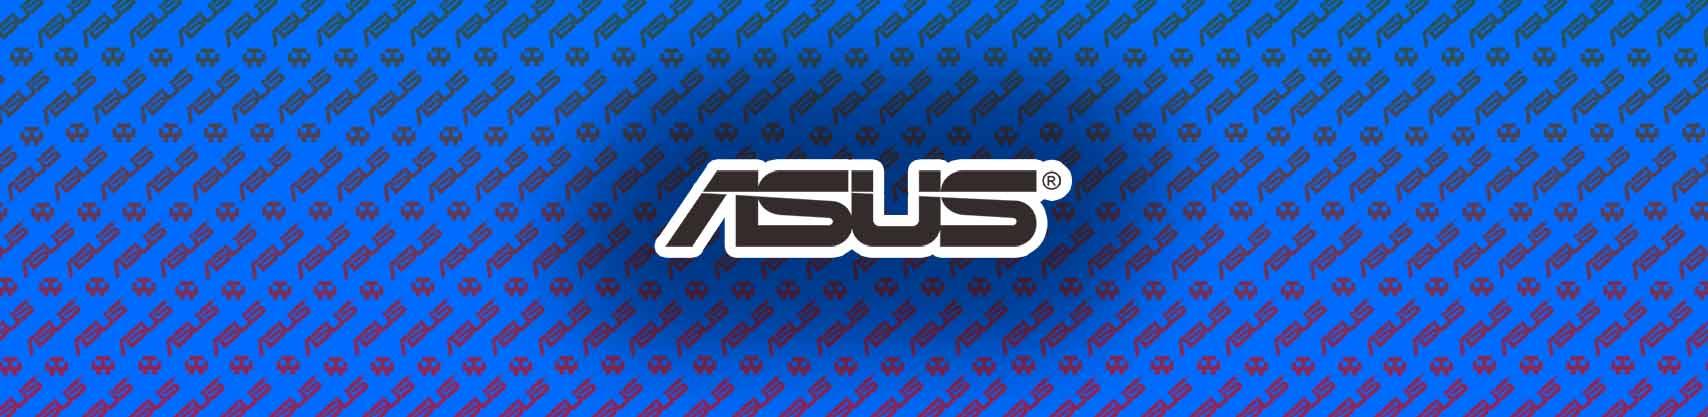 Asus Z87 PRO Manual